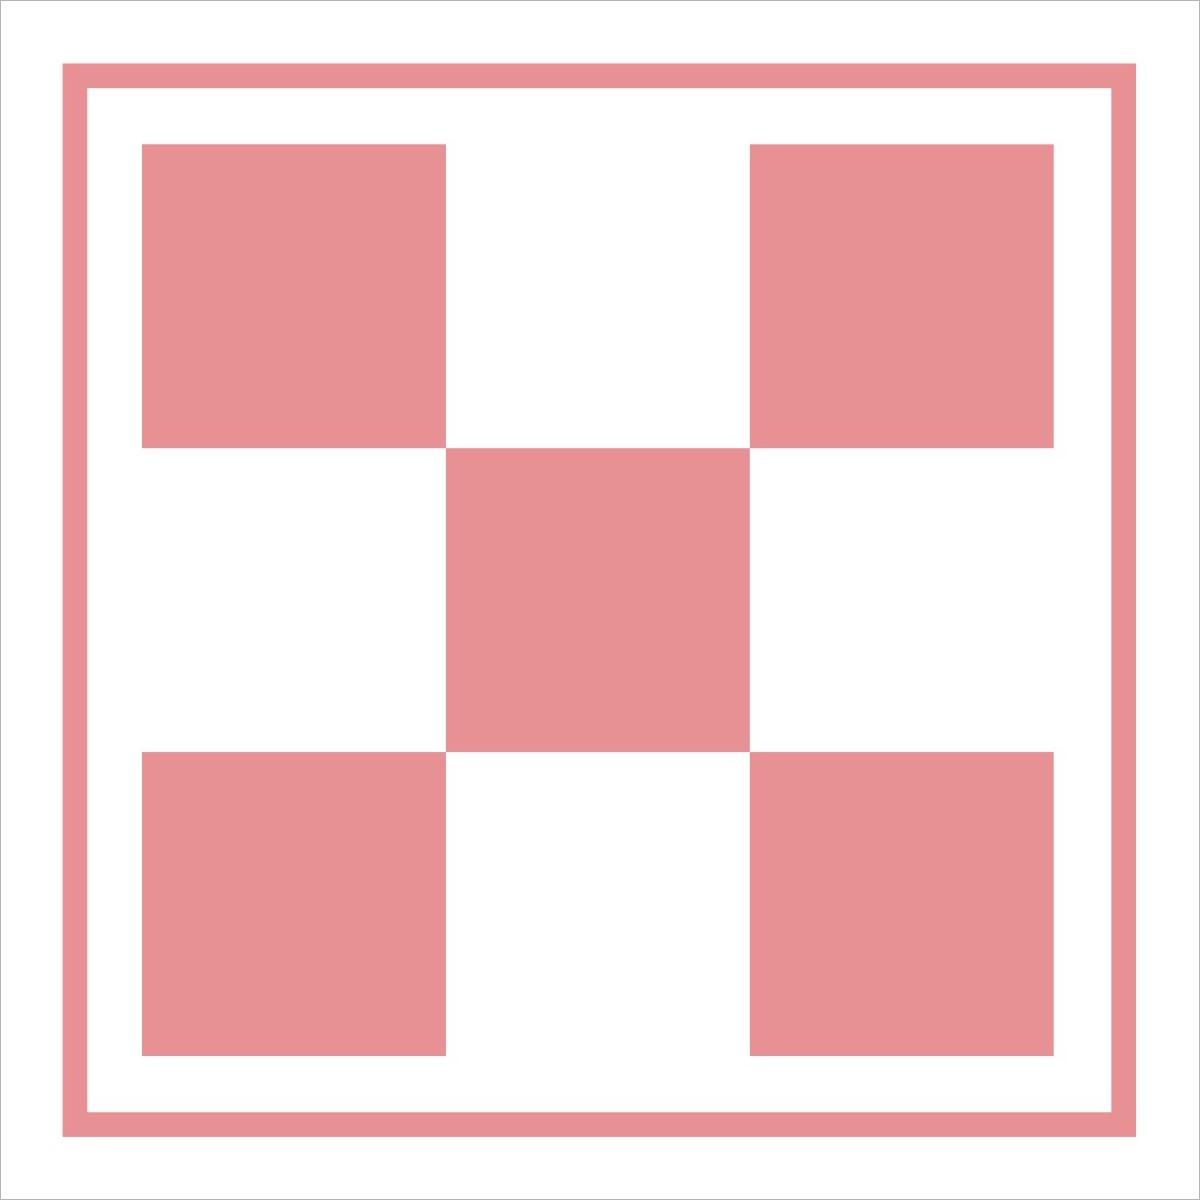 Tidy Cats BREEZE XL Litter System